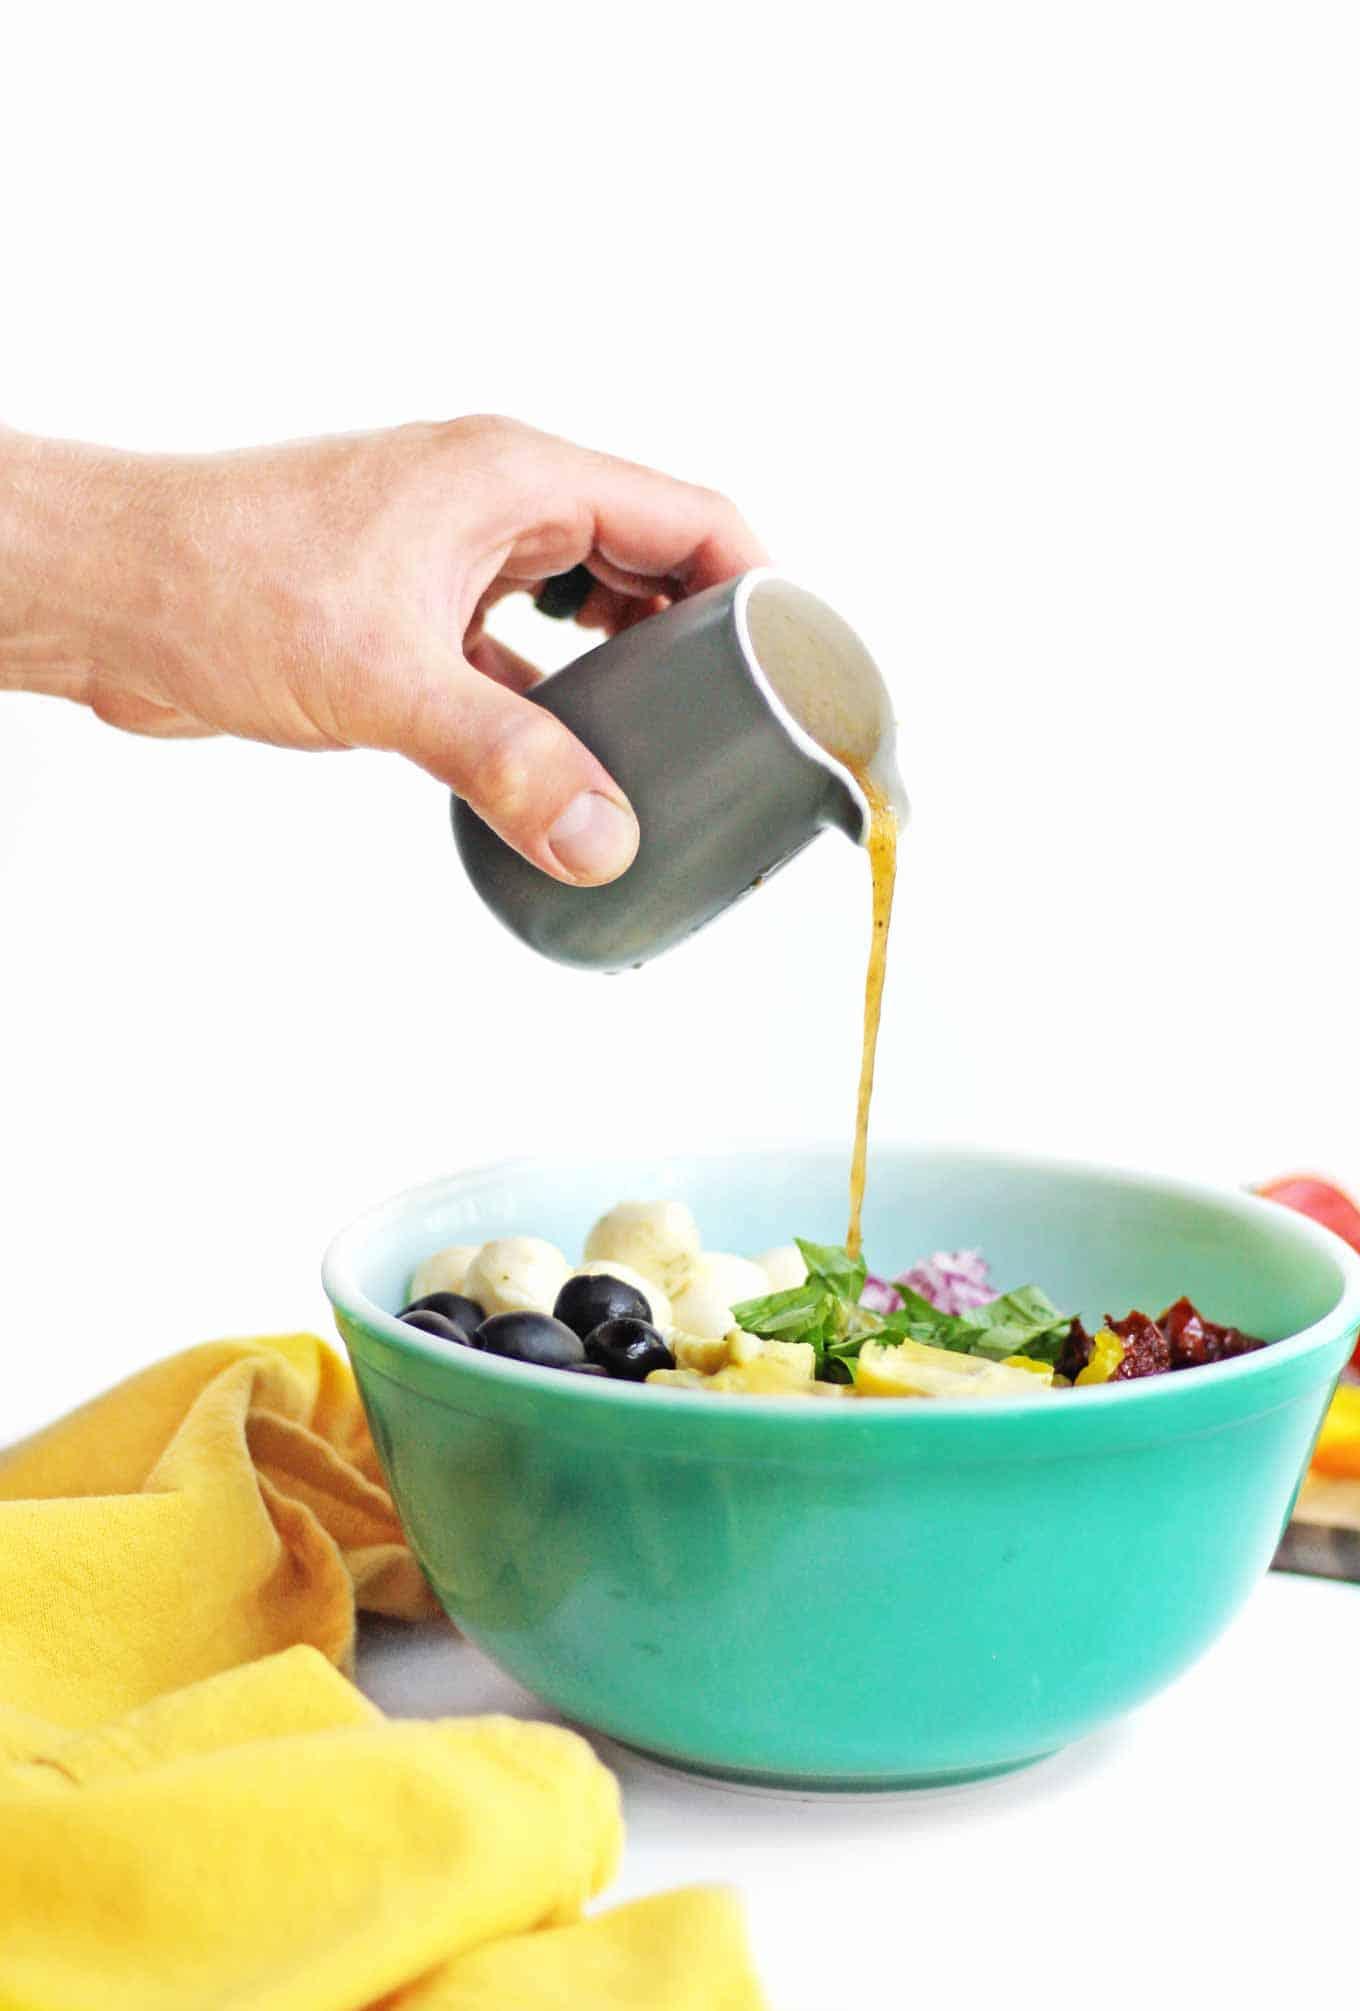 Pouring dressing onto pasta salad